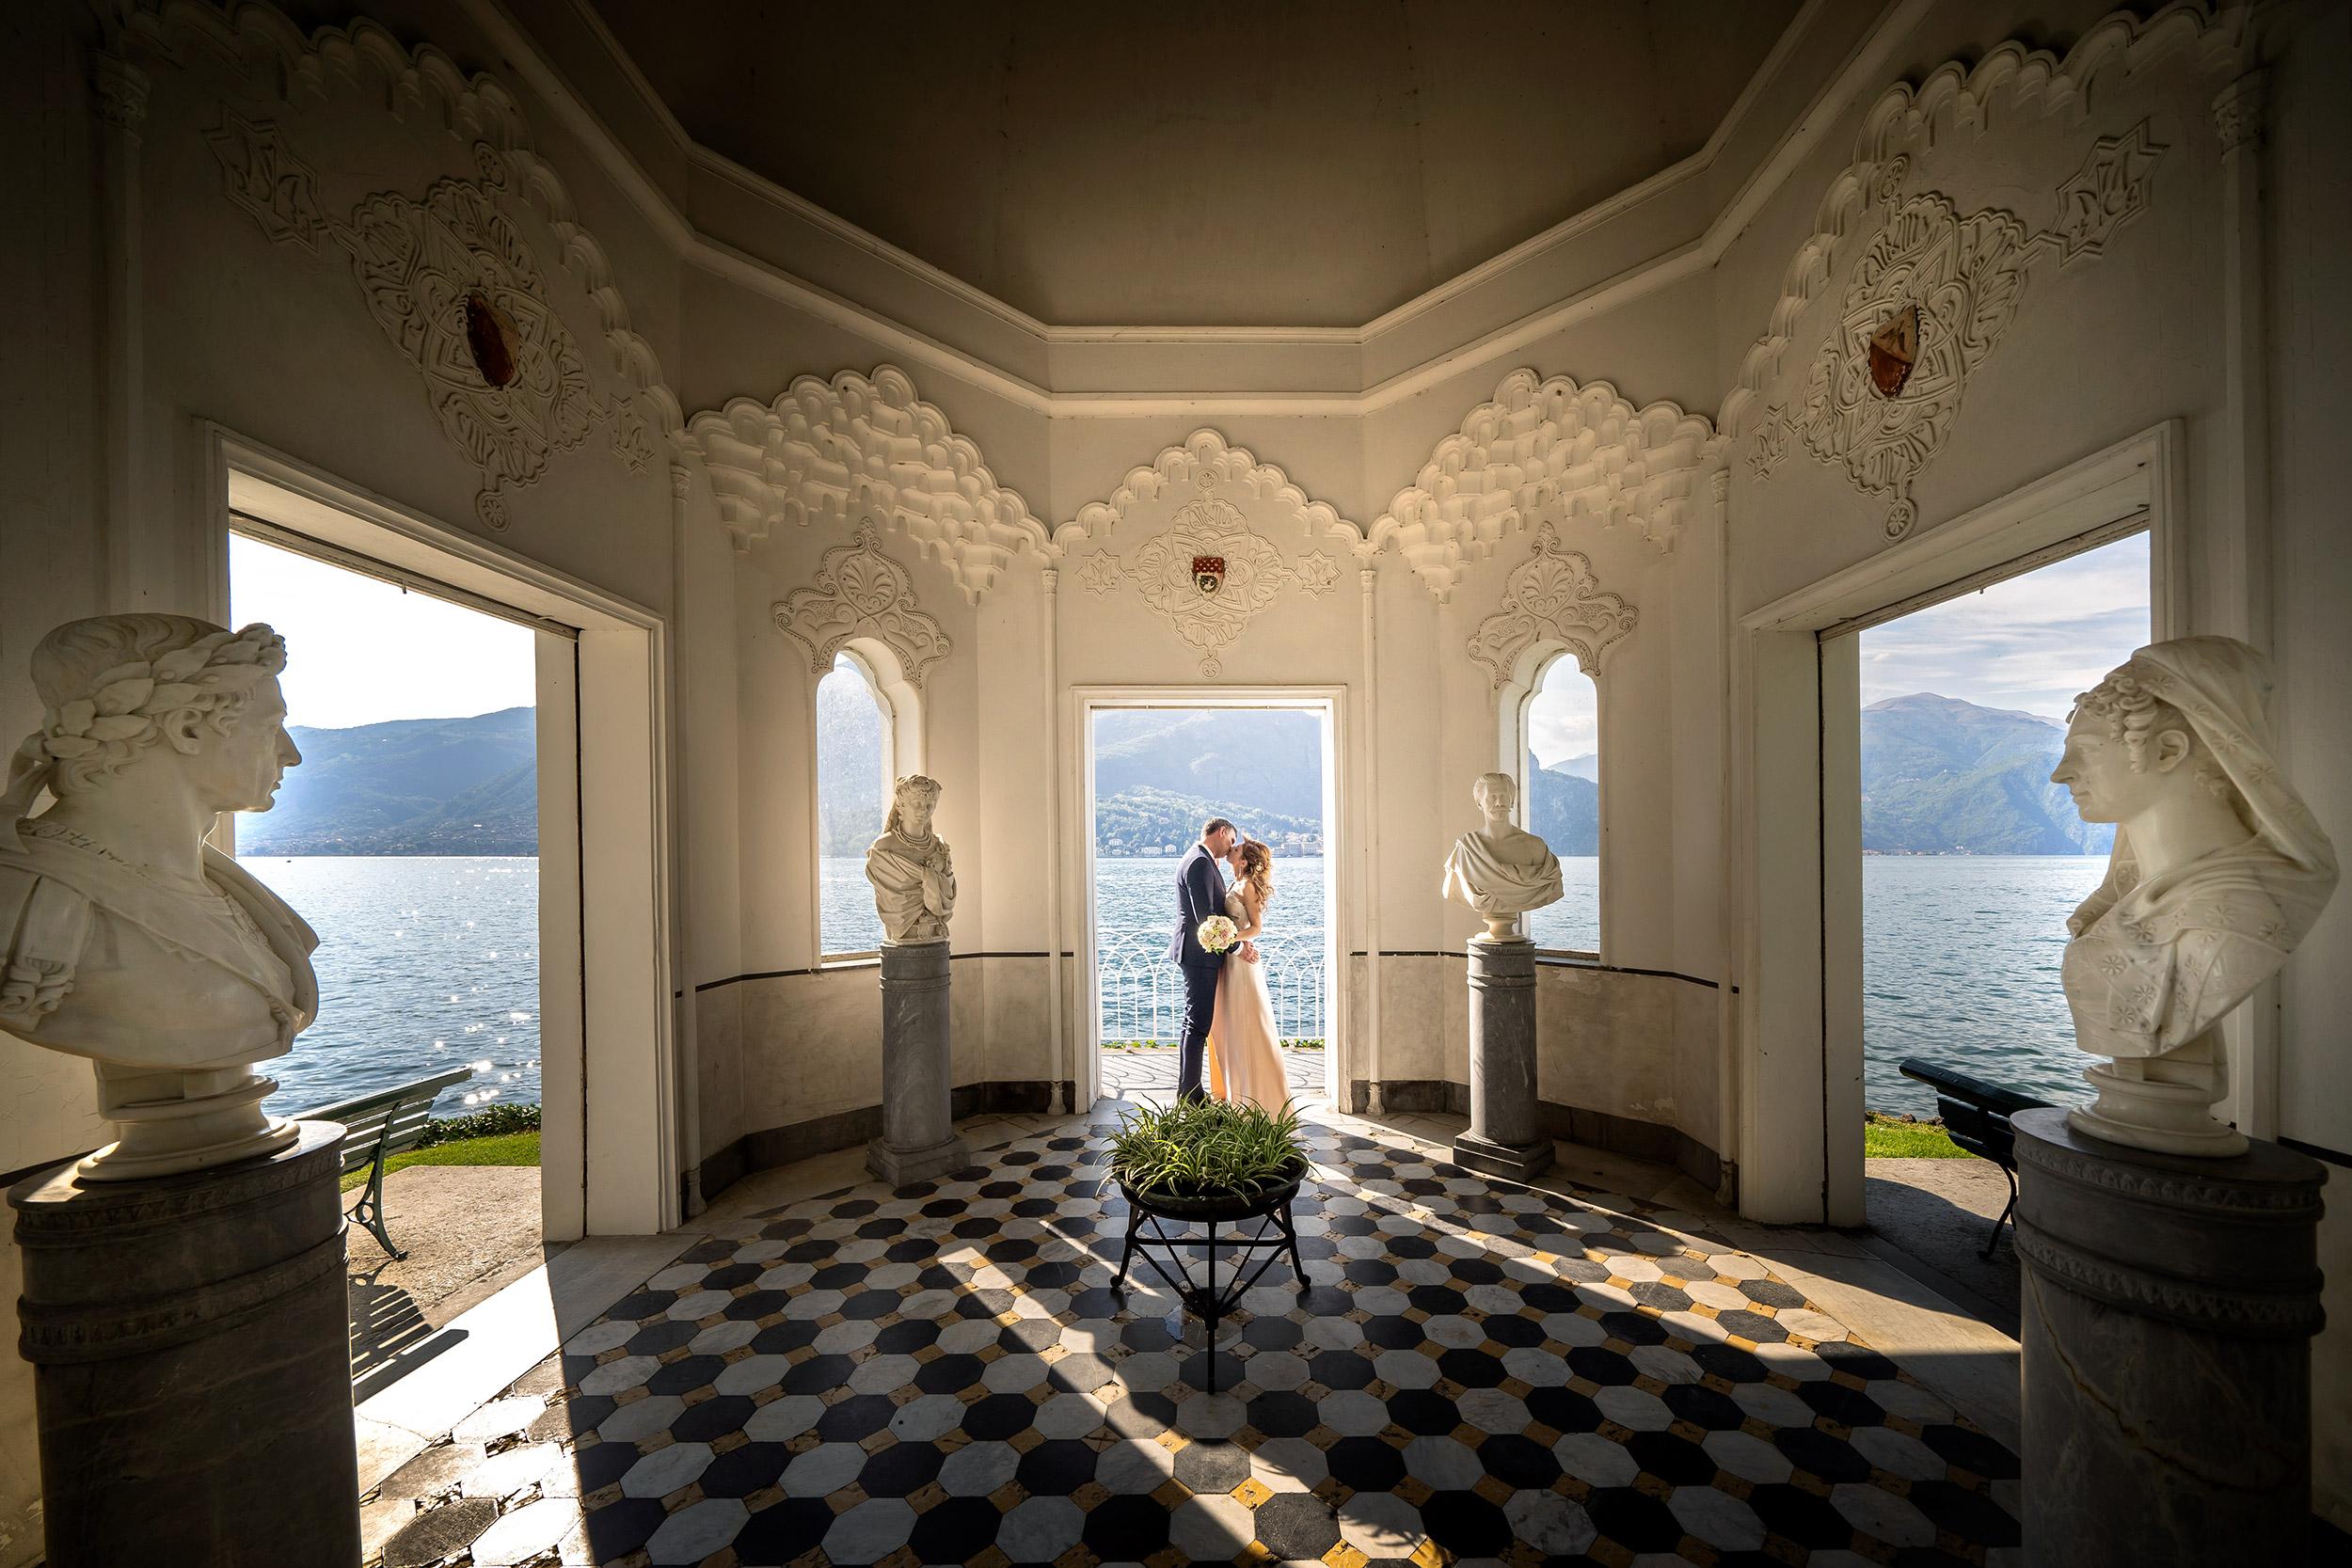 000 reportage wedding sposi foto matrimonio villa melzi bellagio como 3